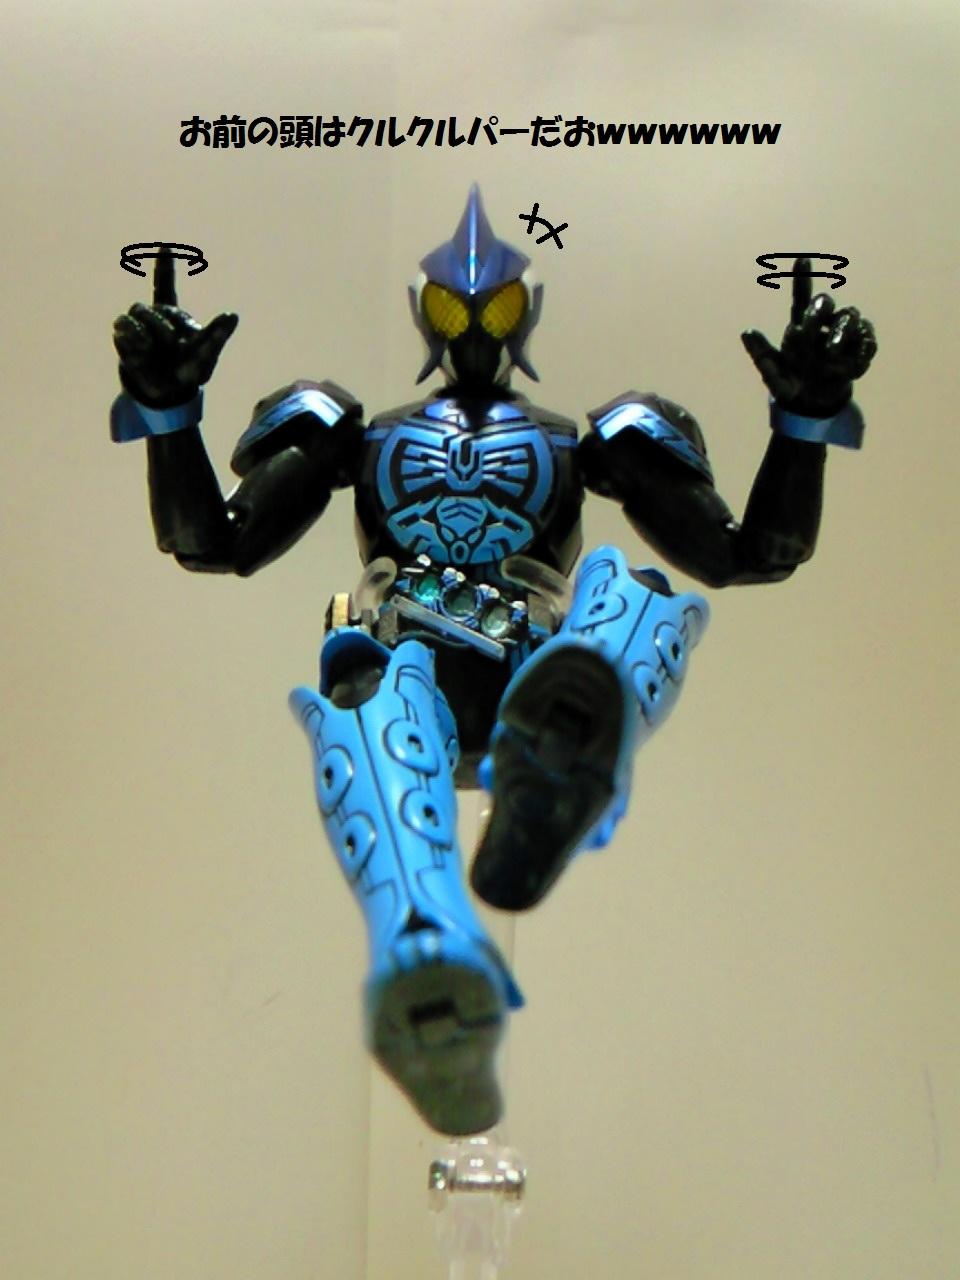 http://blog-imgs-61.fc2.com/k/y/a/kyarasokuhou/CstAr85.jpg